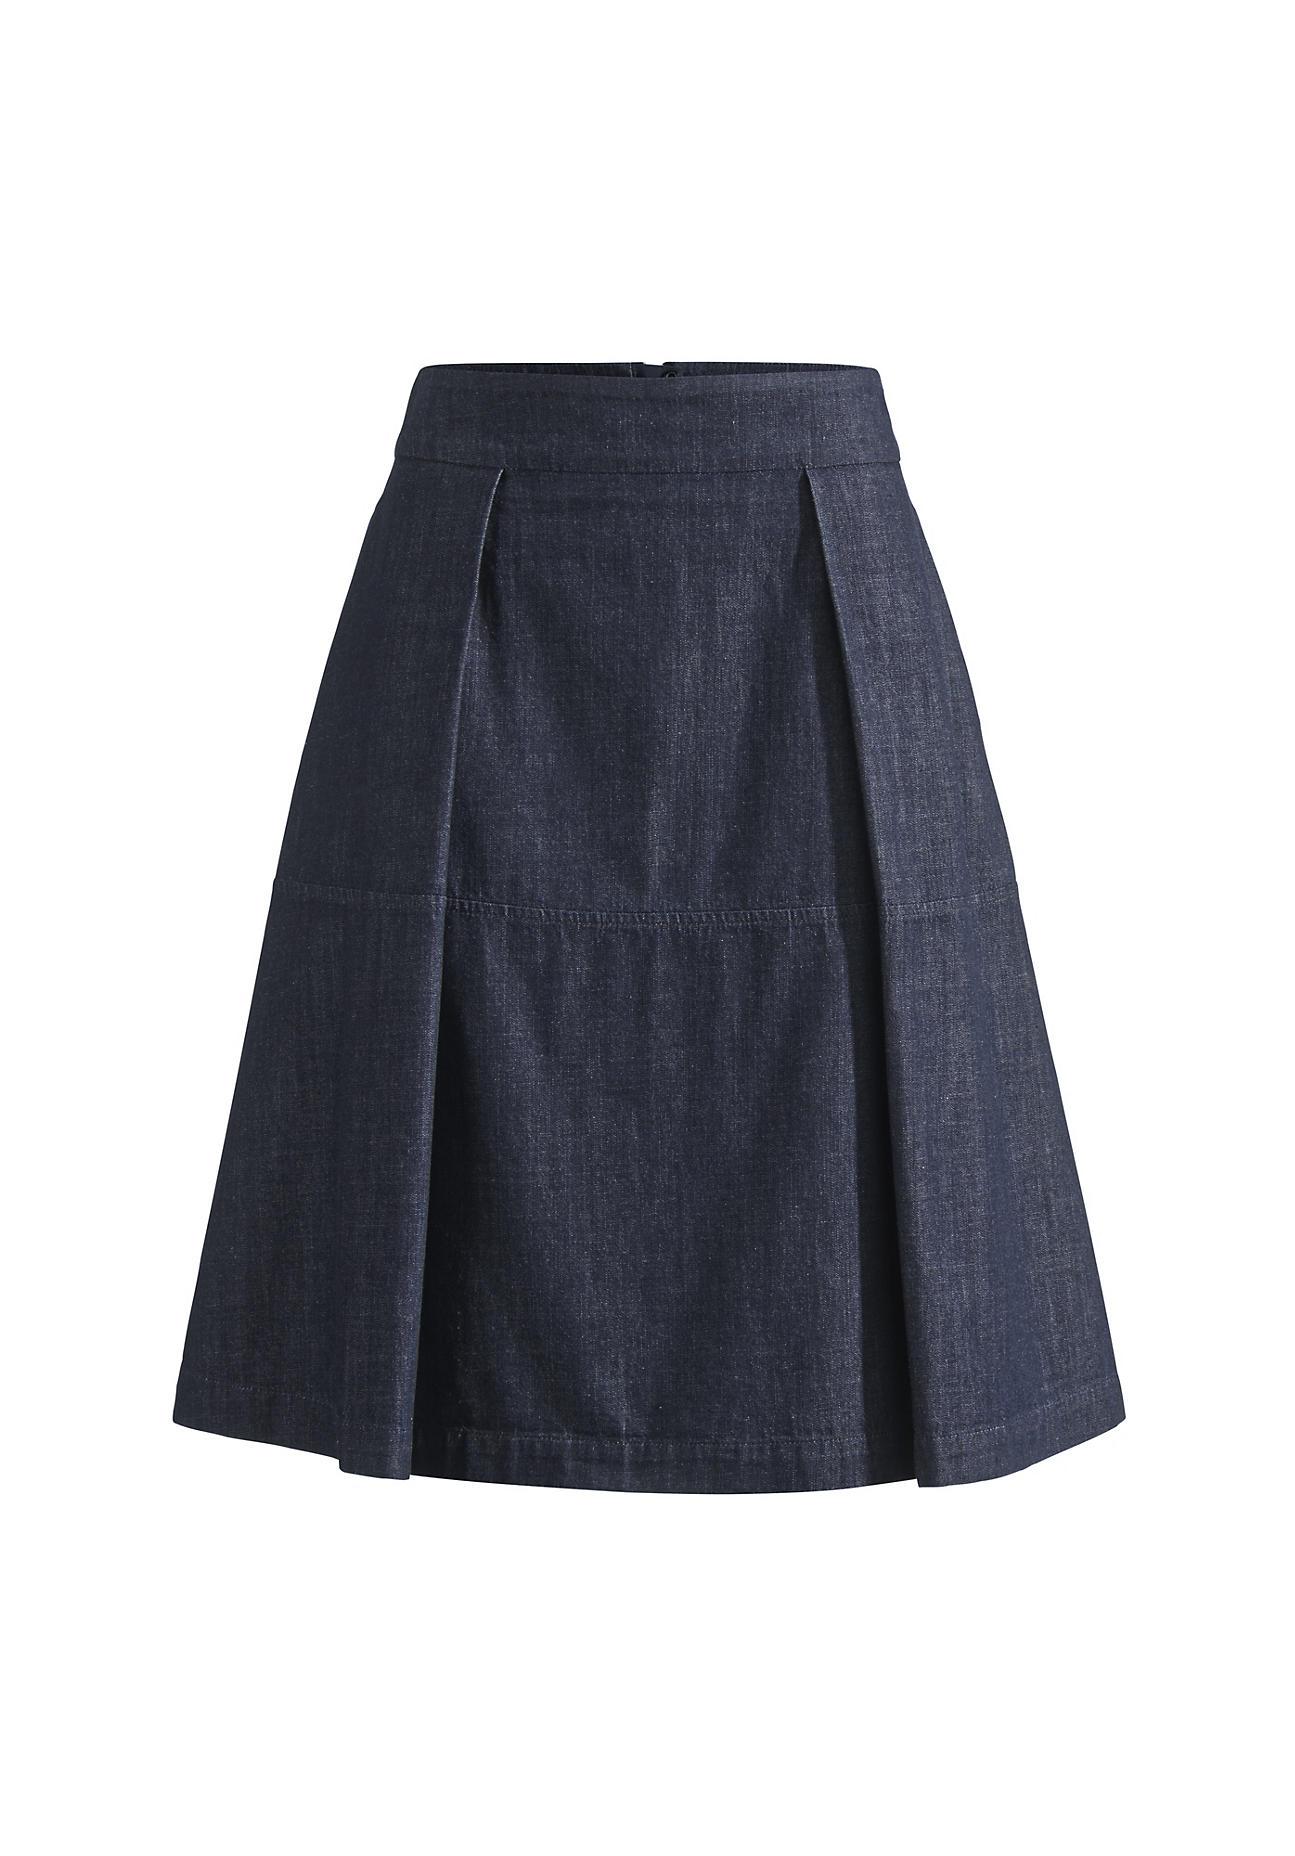 hessnatur Damen Jeansrock aus Bio Baumwolle – blau – Größe 38